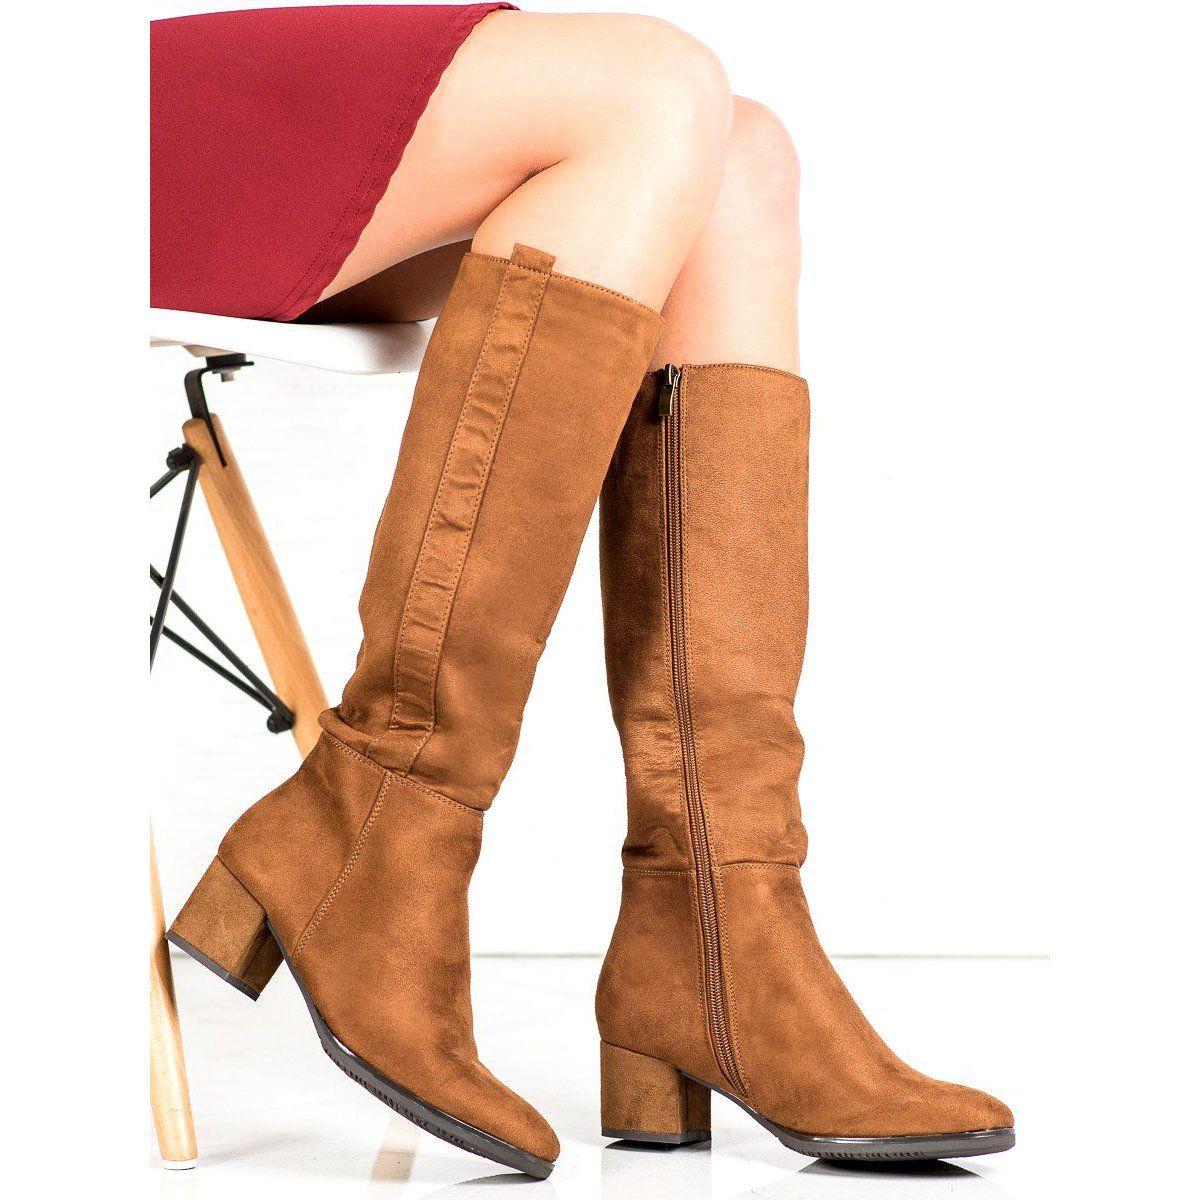 Filippo Klasyczne Brazowe Kozaczki Boots Womens Knee Boots Brown Boots